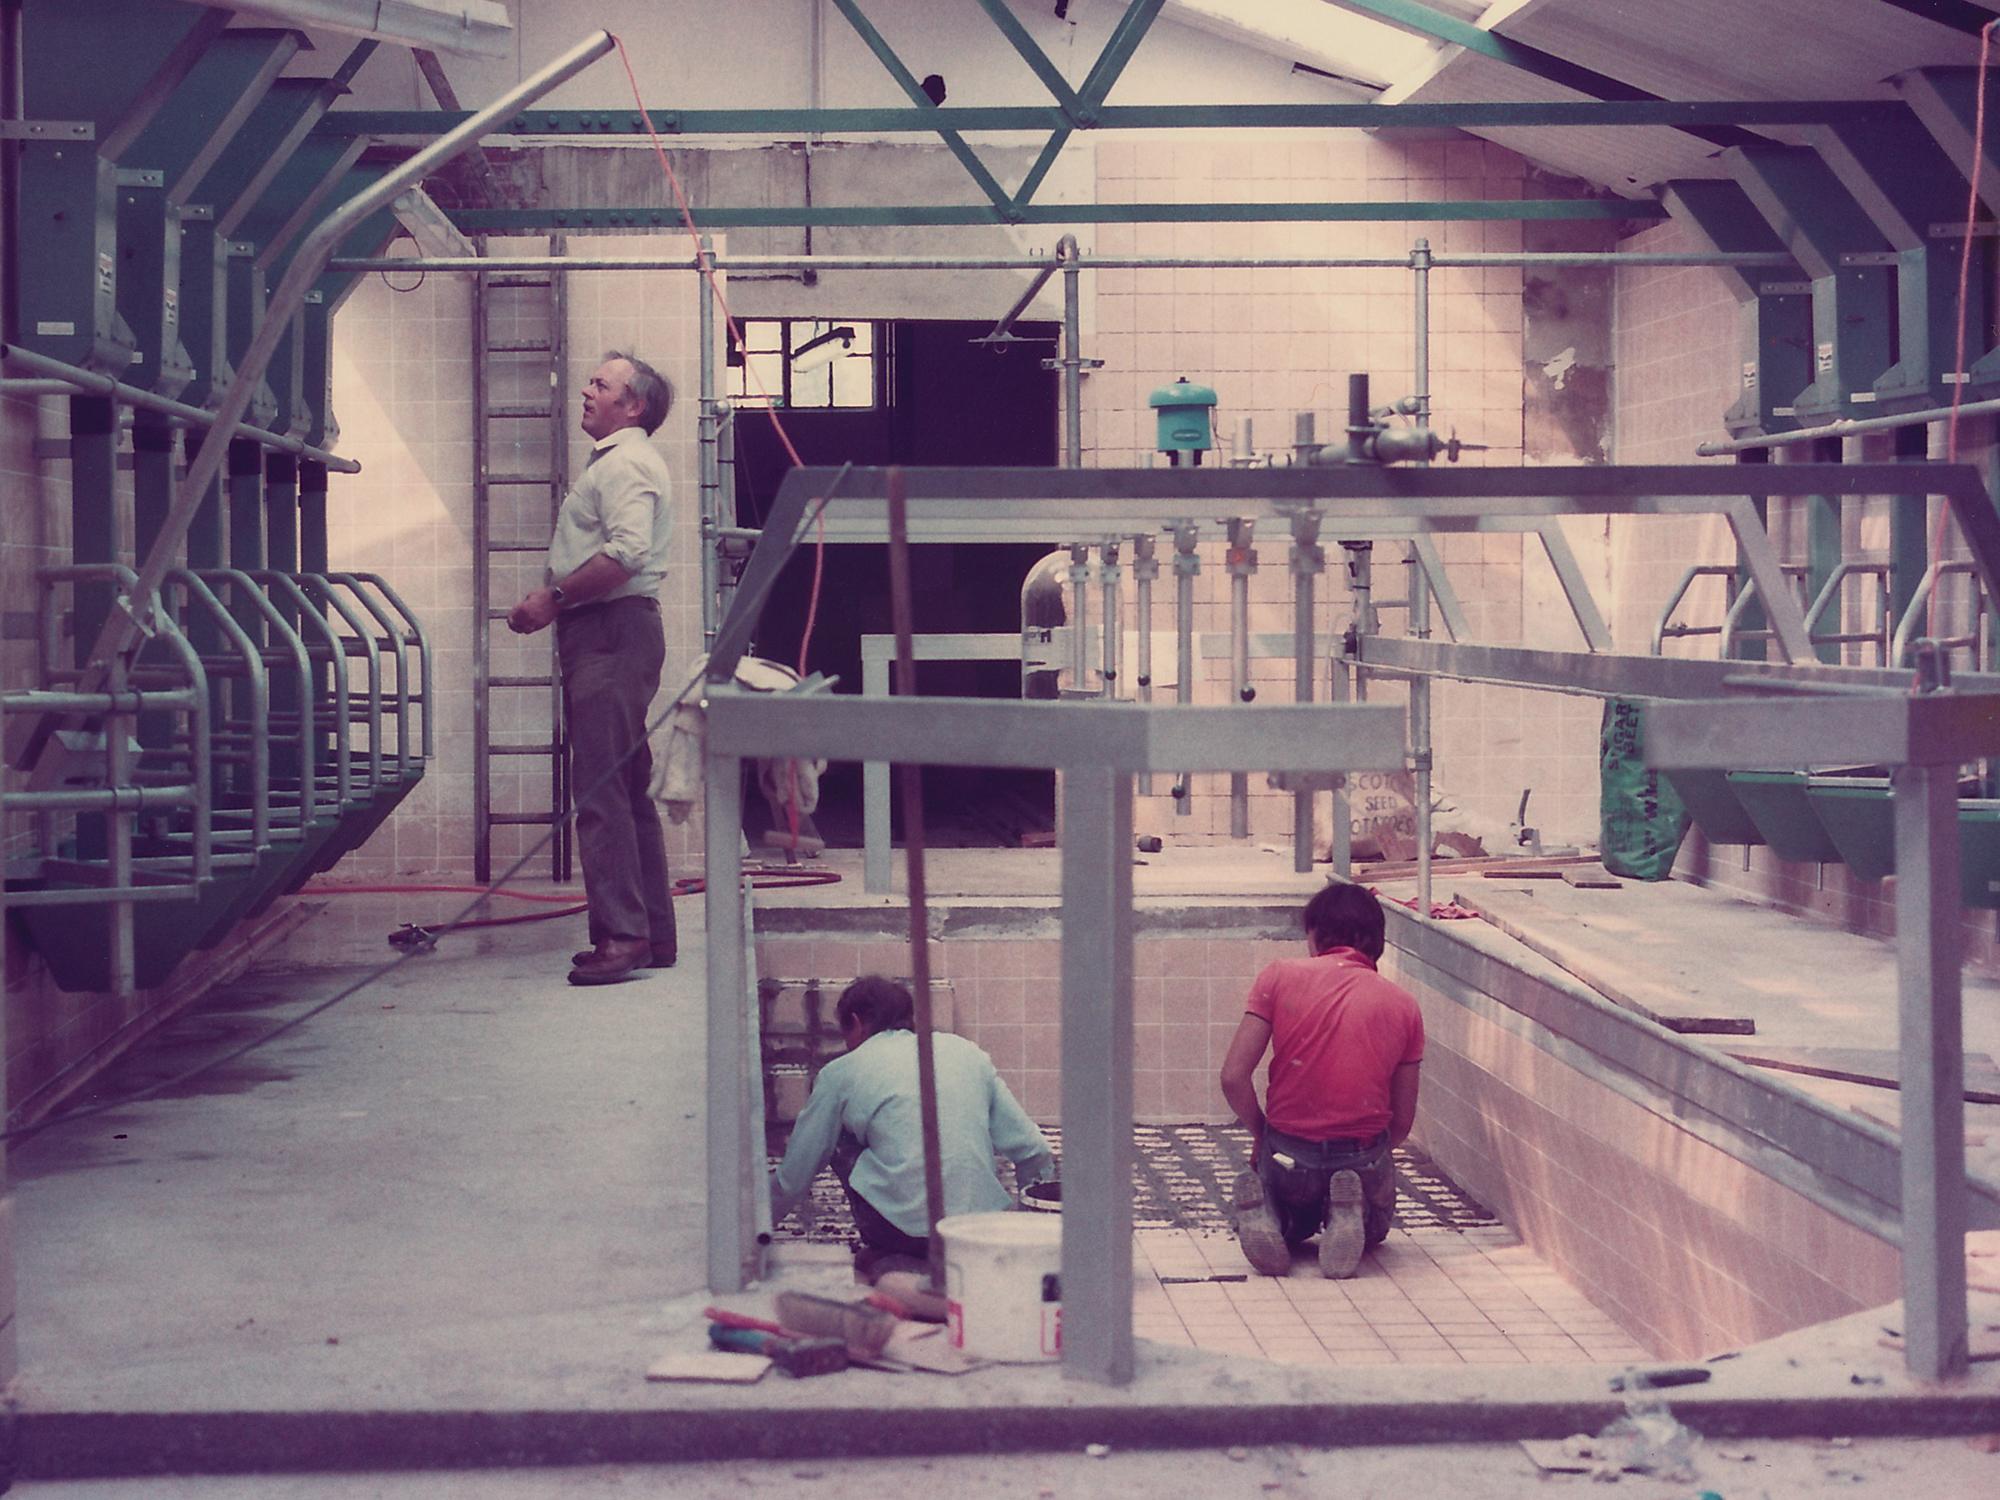 https://creativejuicesbrewingcompany.com/wp-content/uploads/2020/03/1984-08-Milk-Parlour-Tiling-with-John-Chapman.jpg